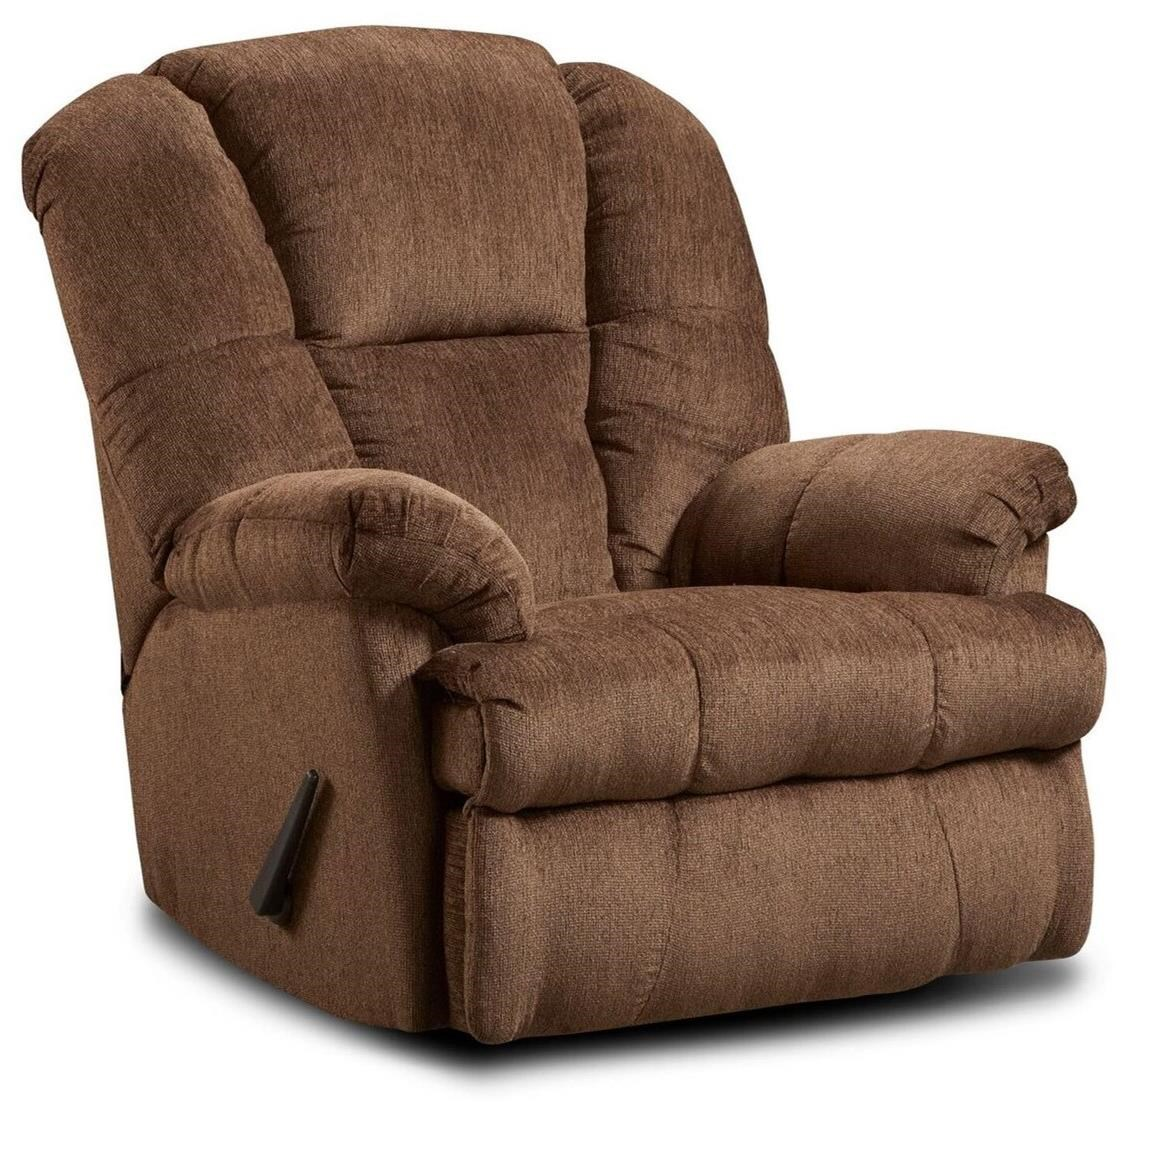 9745 Recliner by Washington Furniture at Lynn's Furniture & Mattress